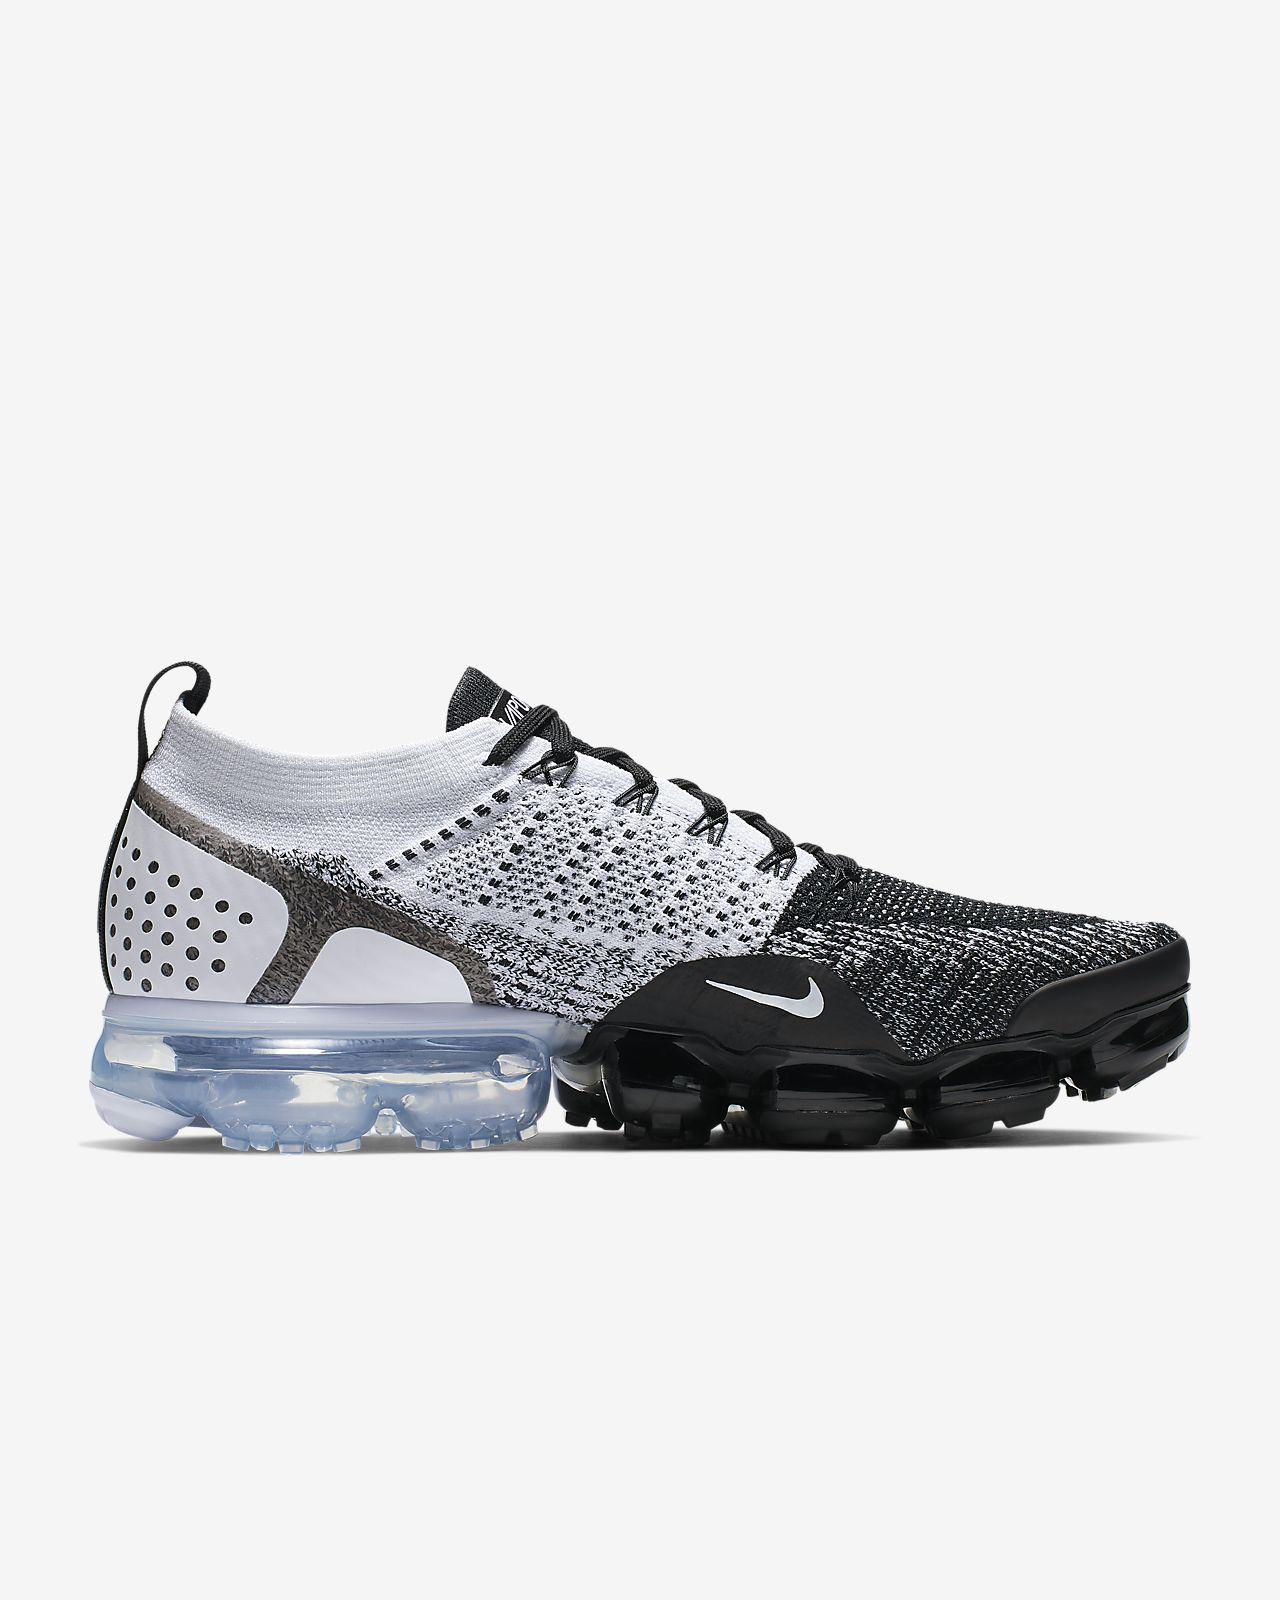 c2cec6b9acb Nike Air VaporMax Flyknit 2 Shoe. Nike.com GB